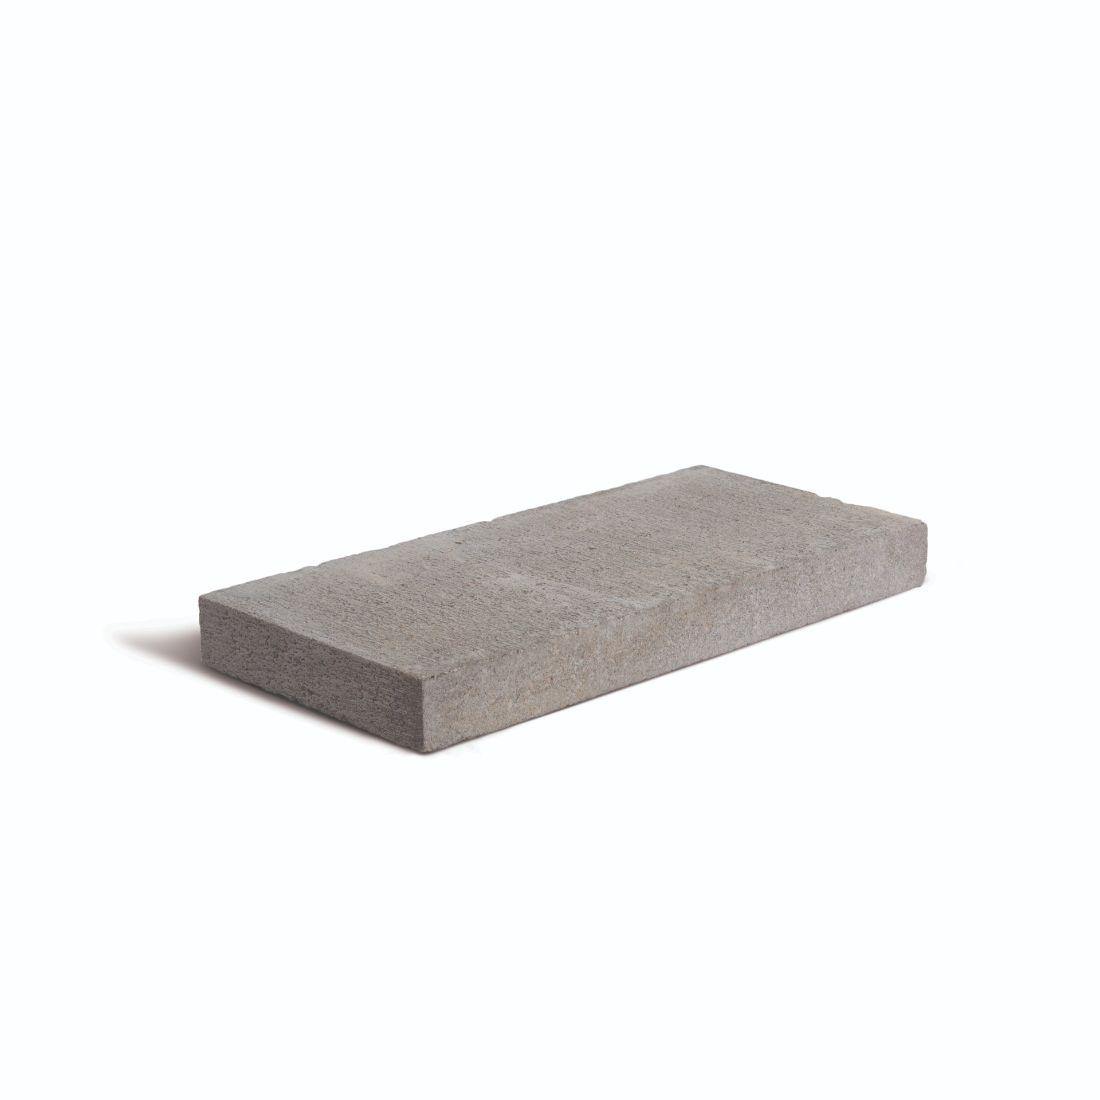 05.17 Capping Block 390 x 190 x 40mm